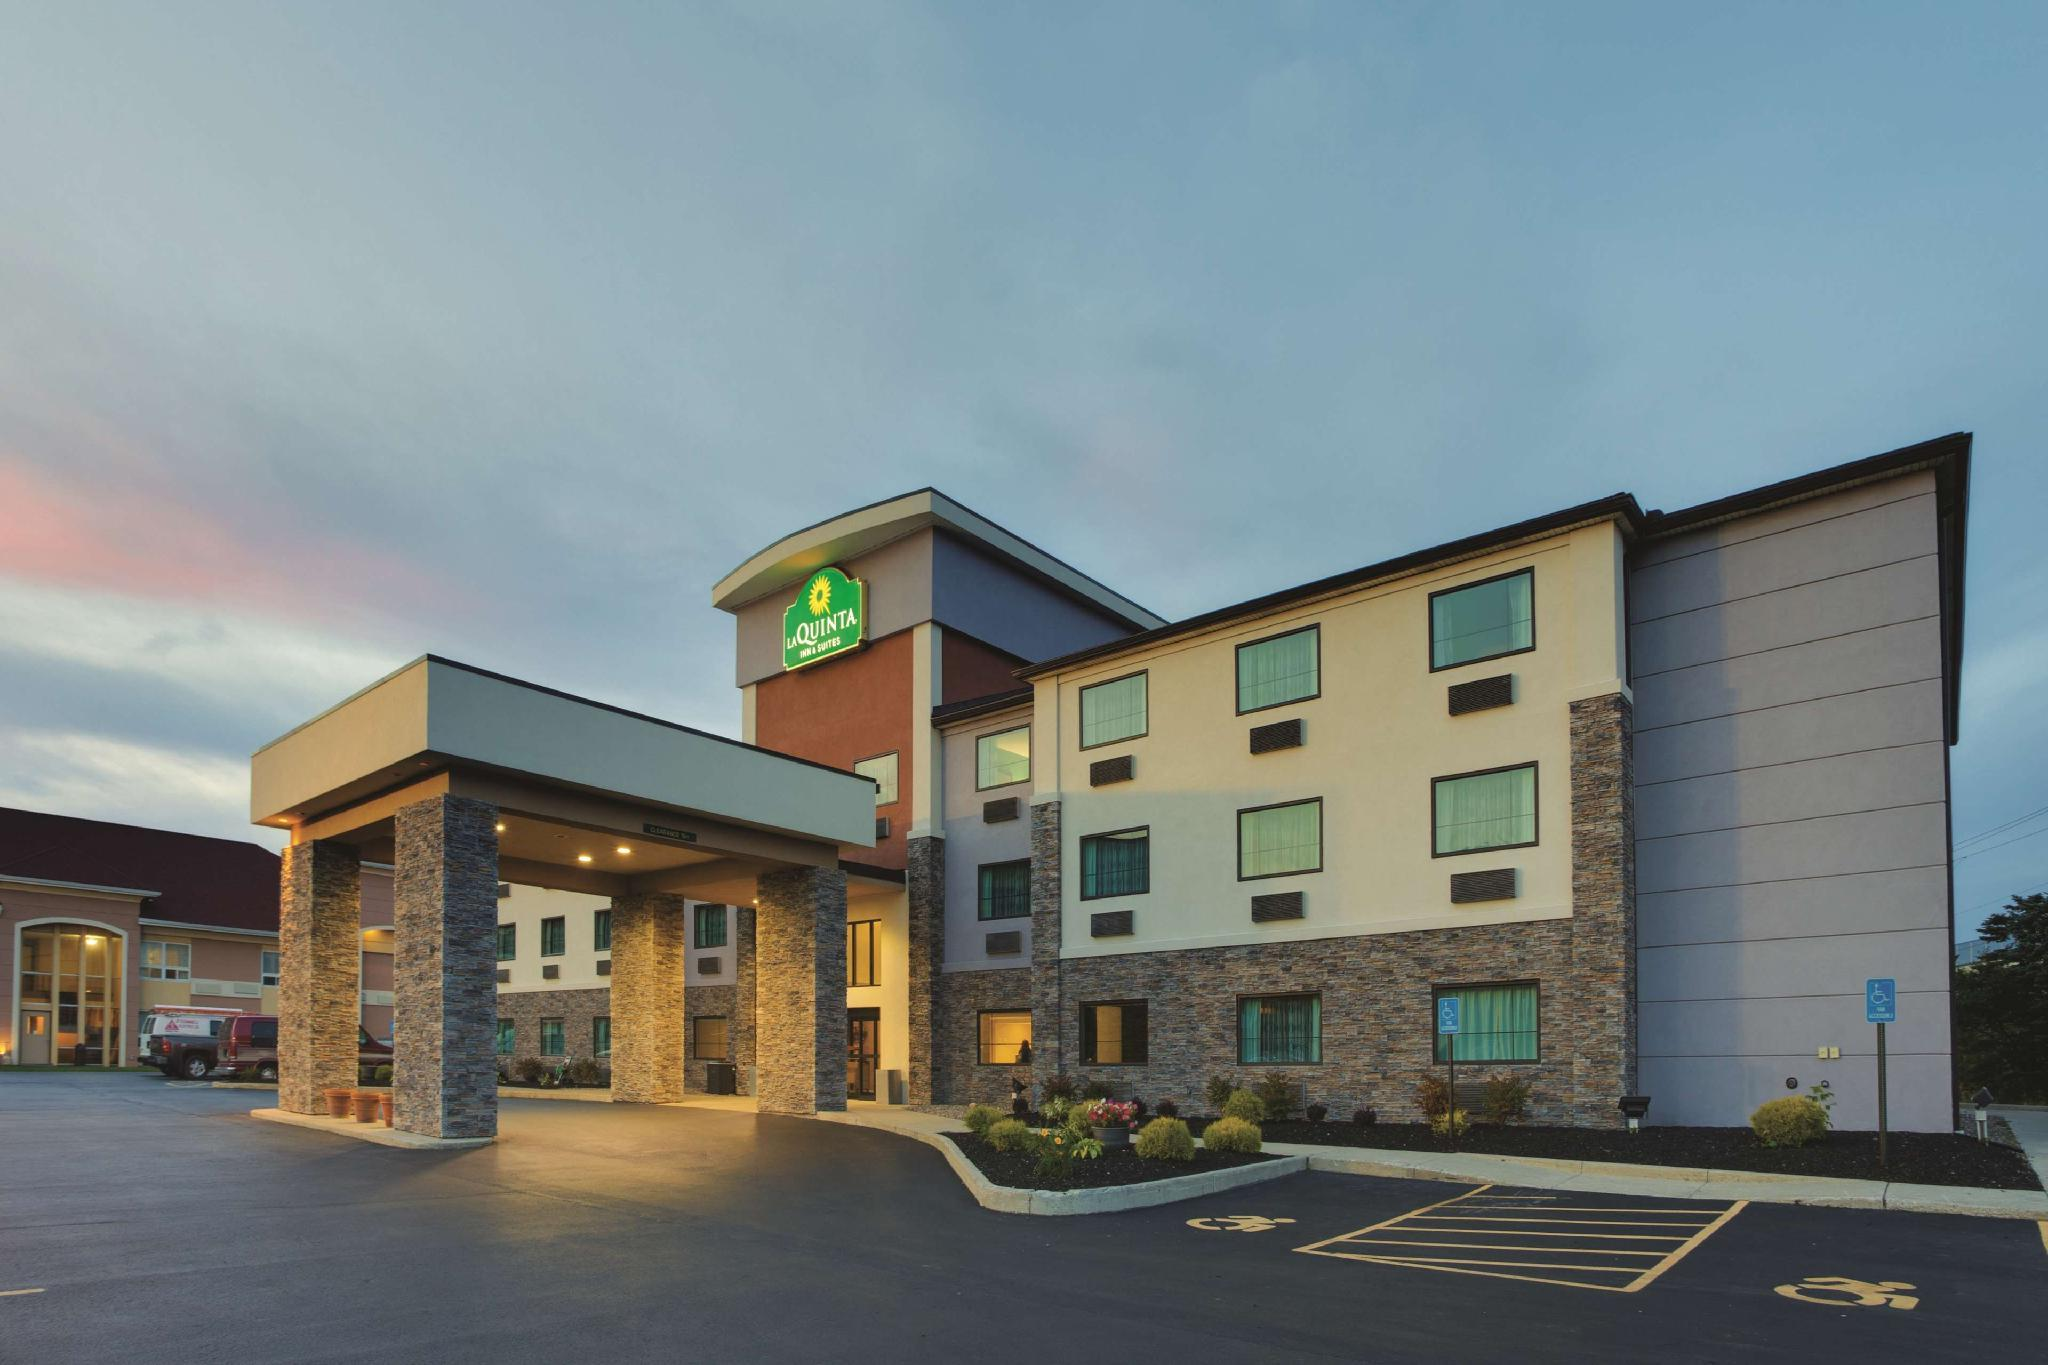 La Quinta Inn And Suites By Wyndham Batavia